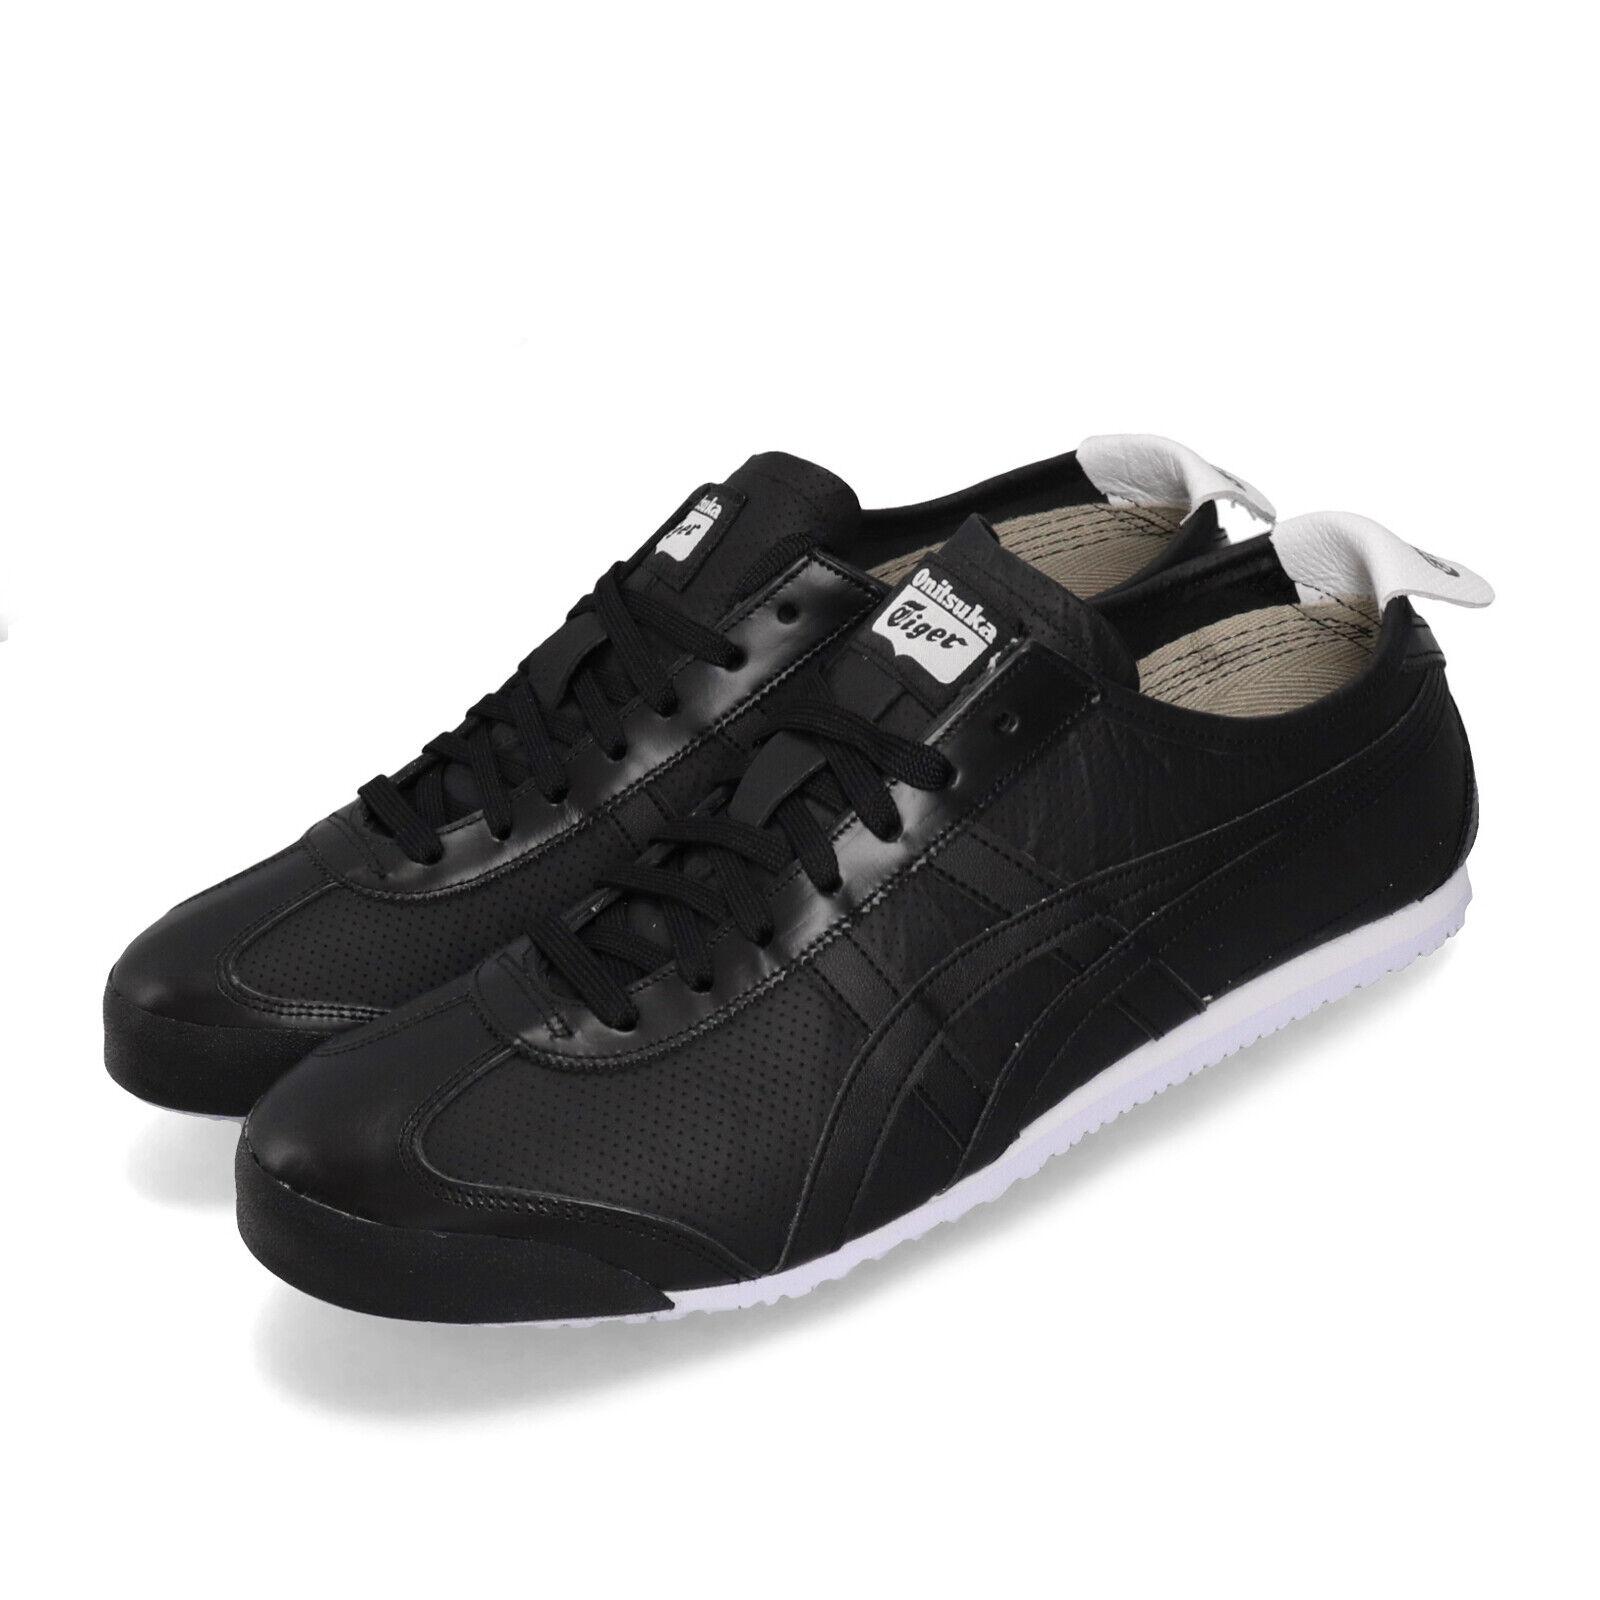 Asics Onitsuka Tiger MEXICO 66 Negro blancoo Zapatos Unisex Hombres Mujeres 1183A443-001